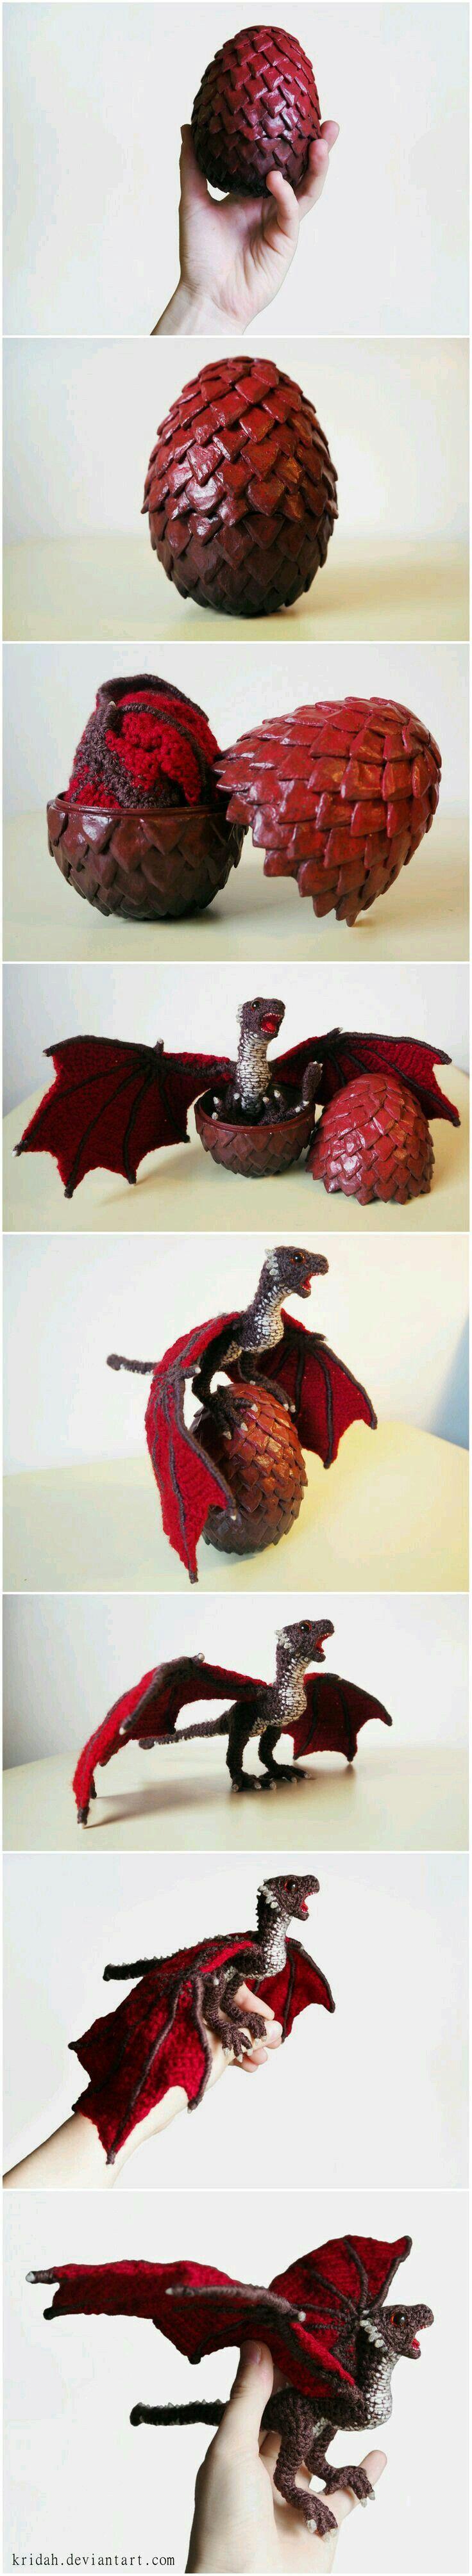 Must buy must buy  Best dragon for stop motion plus it's CUTE!!!!!!!